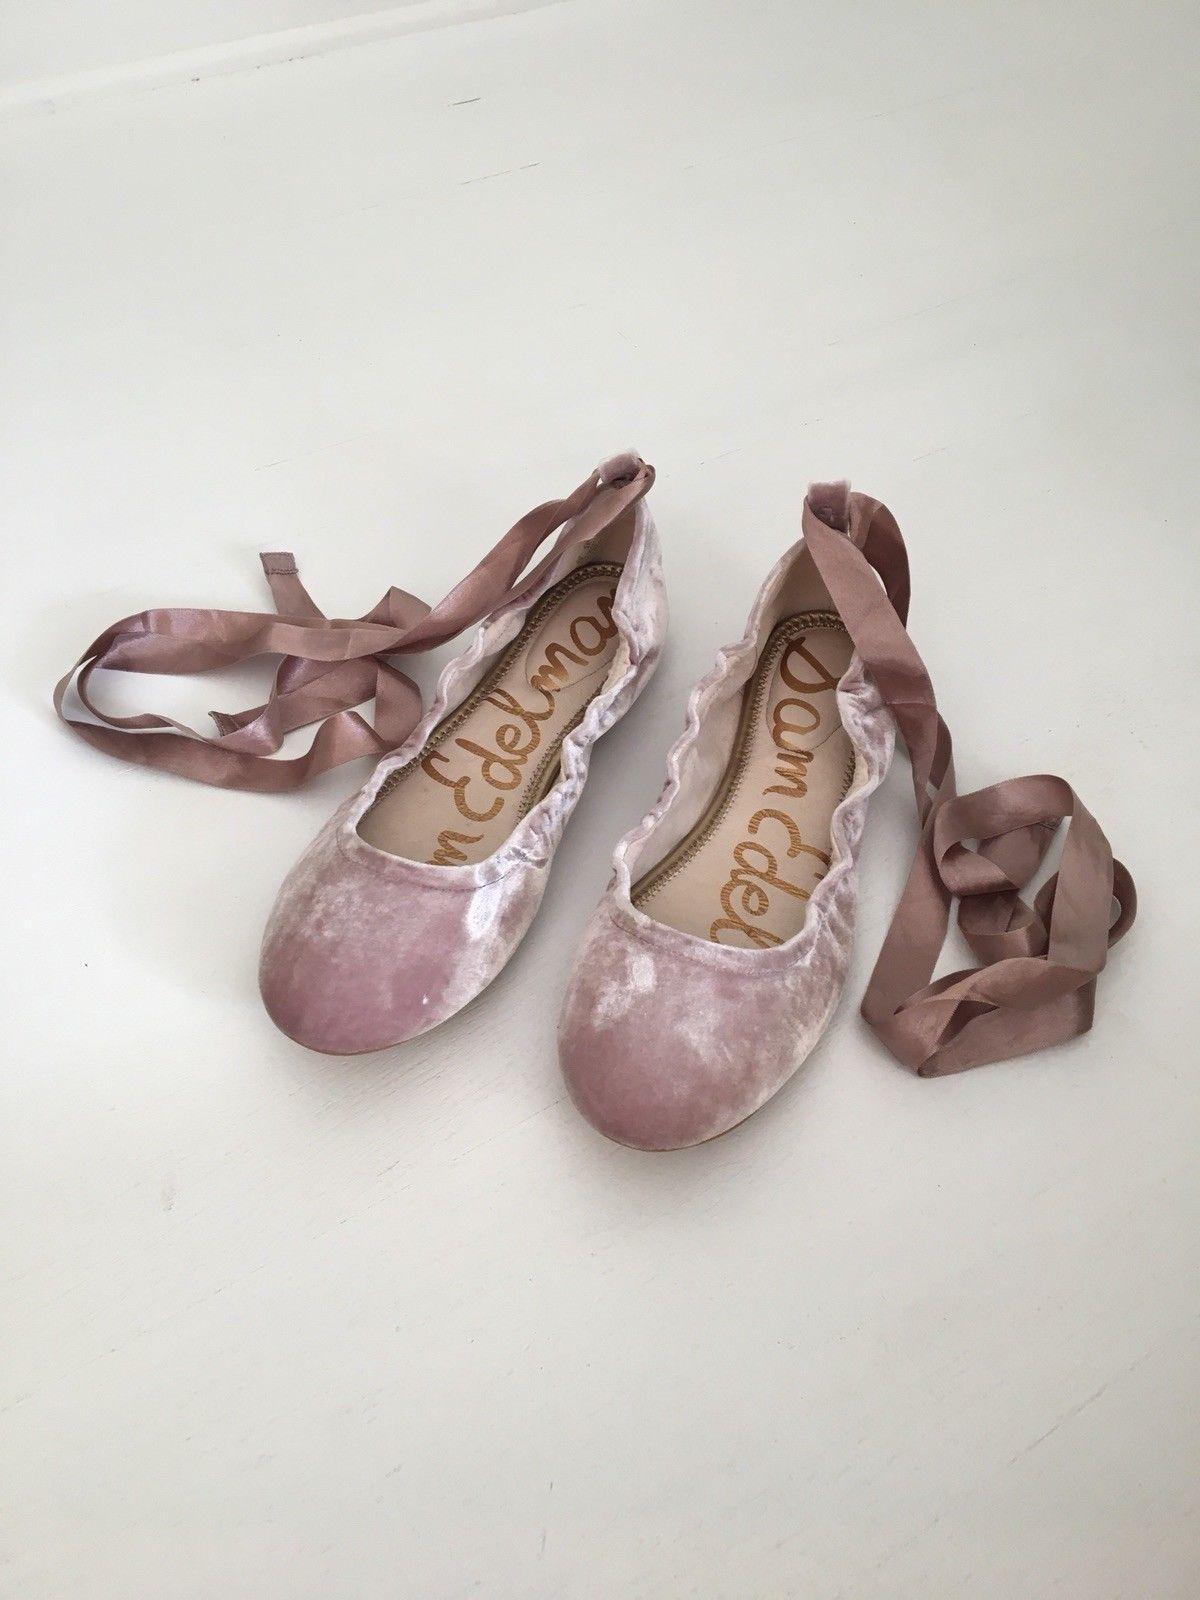 bbf72e3c3 NEW! Sam Edelman Fallon Blush Velvet Ballet Flats Lace Up Size 11 ...